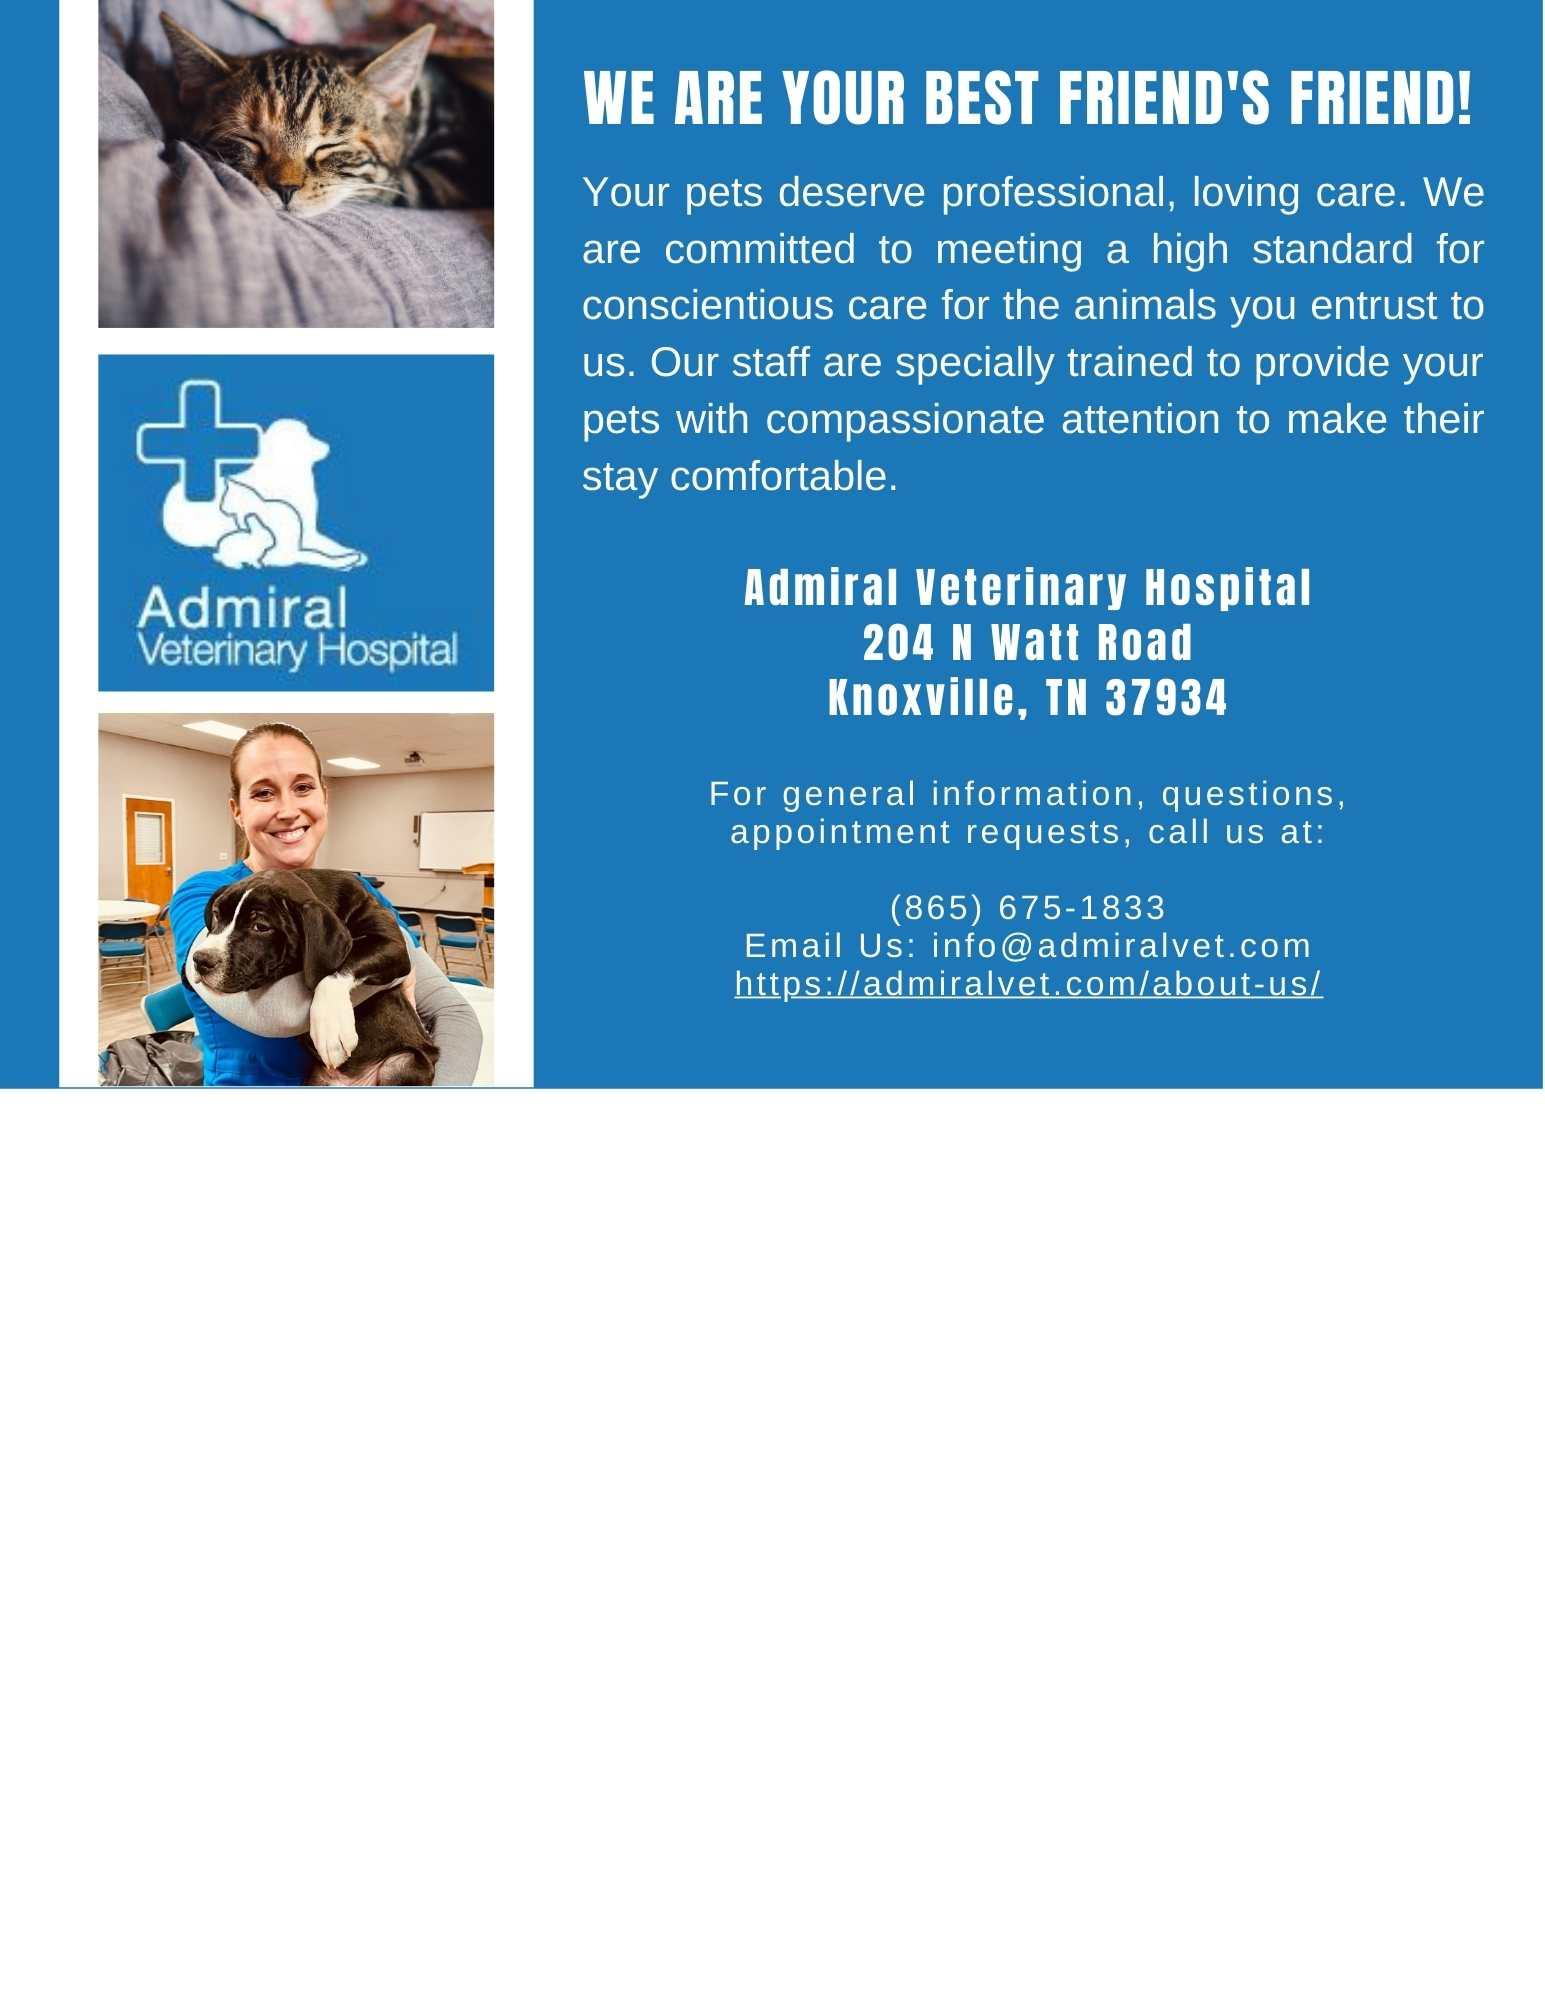 Admiral Veterinary Hospital